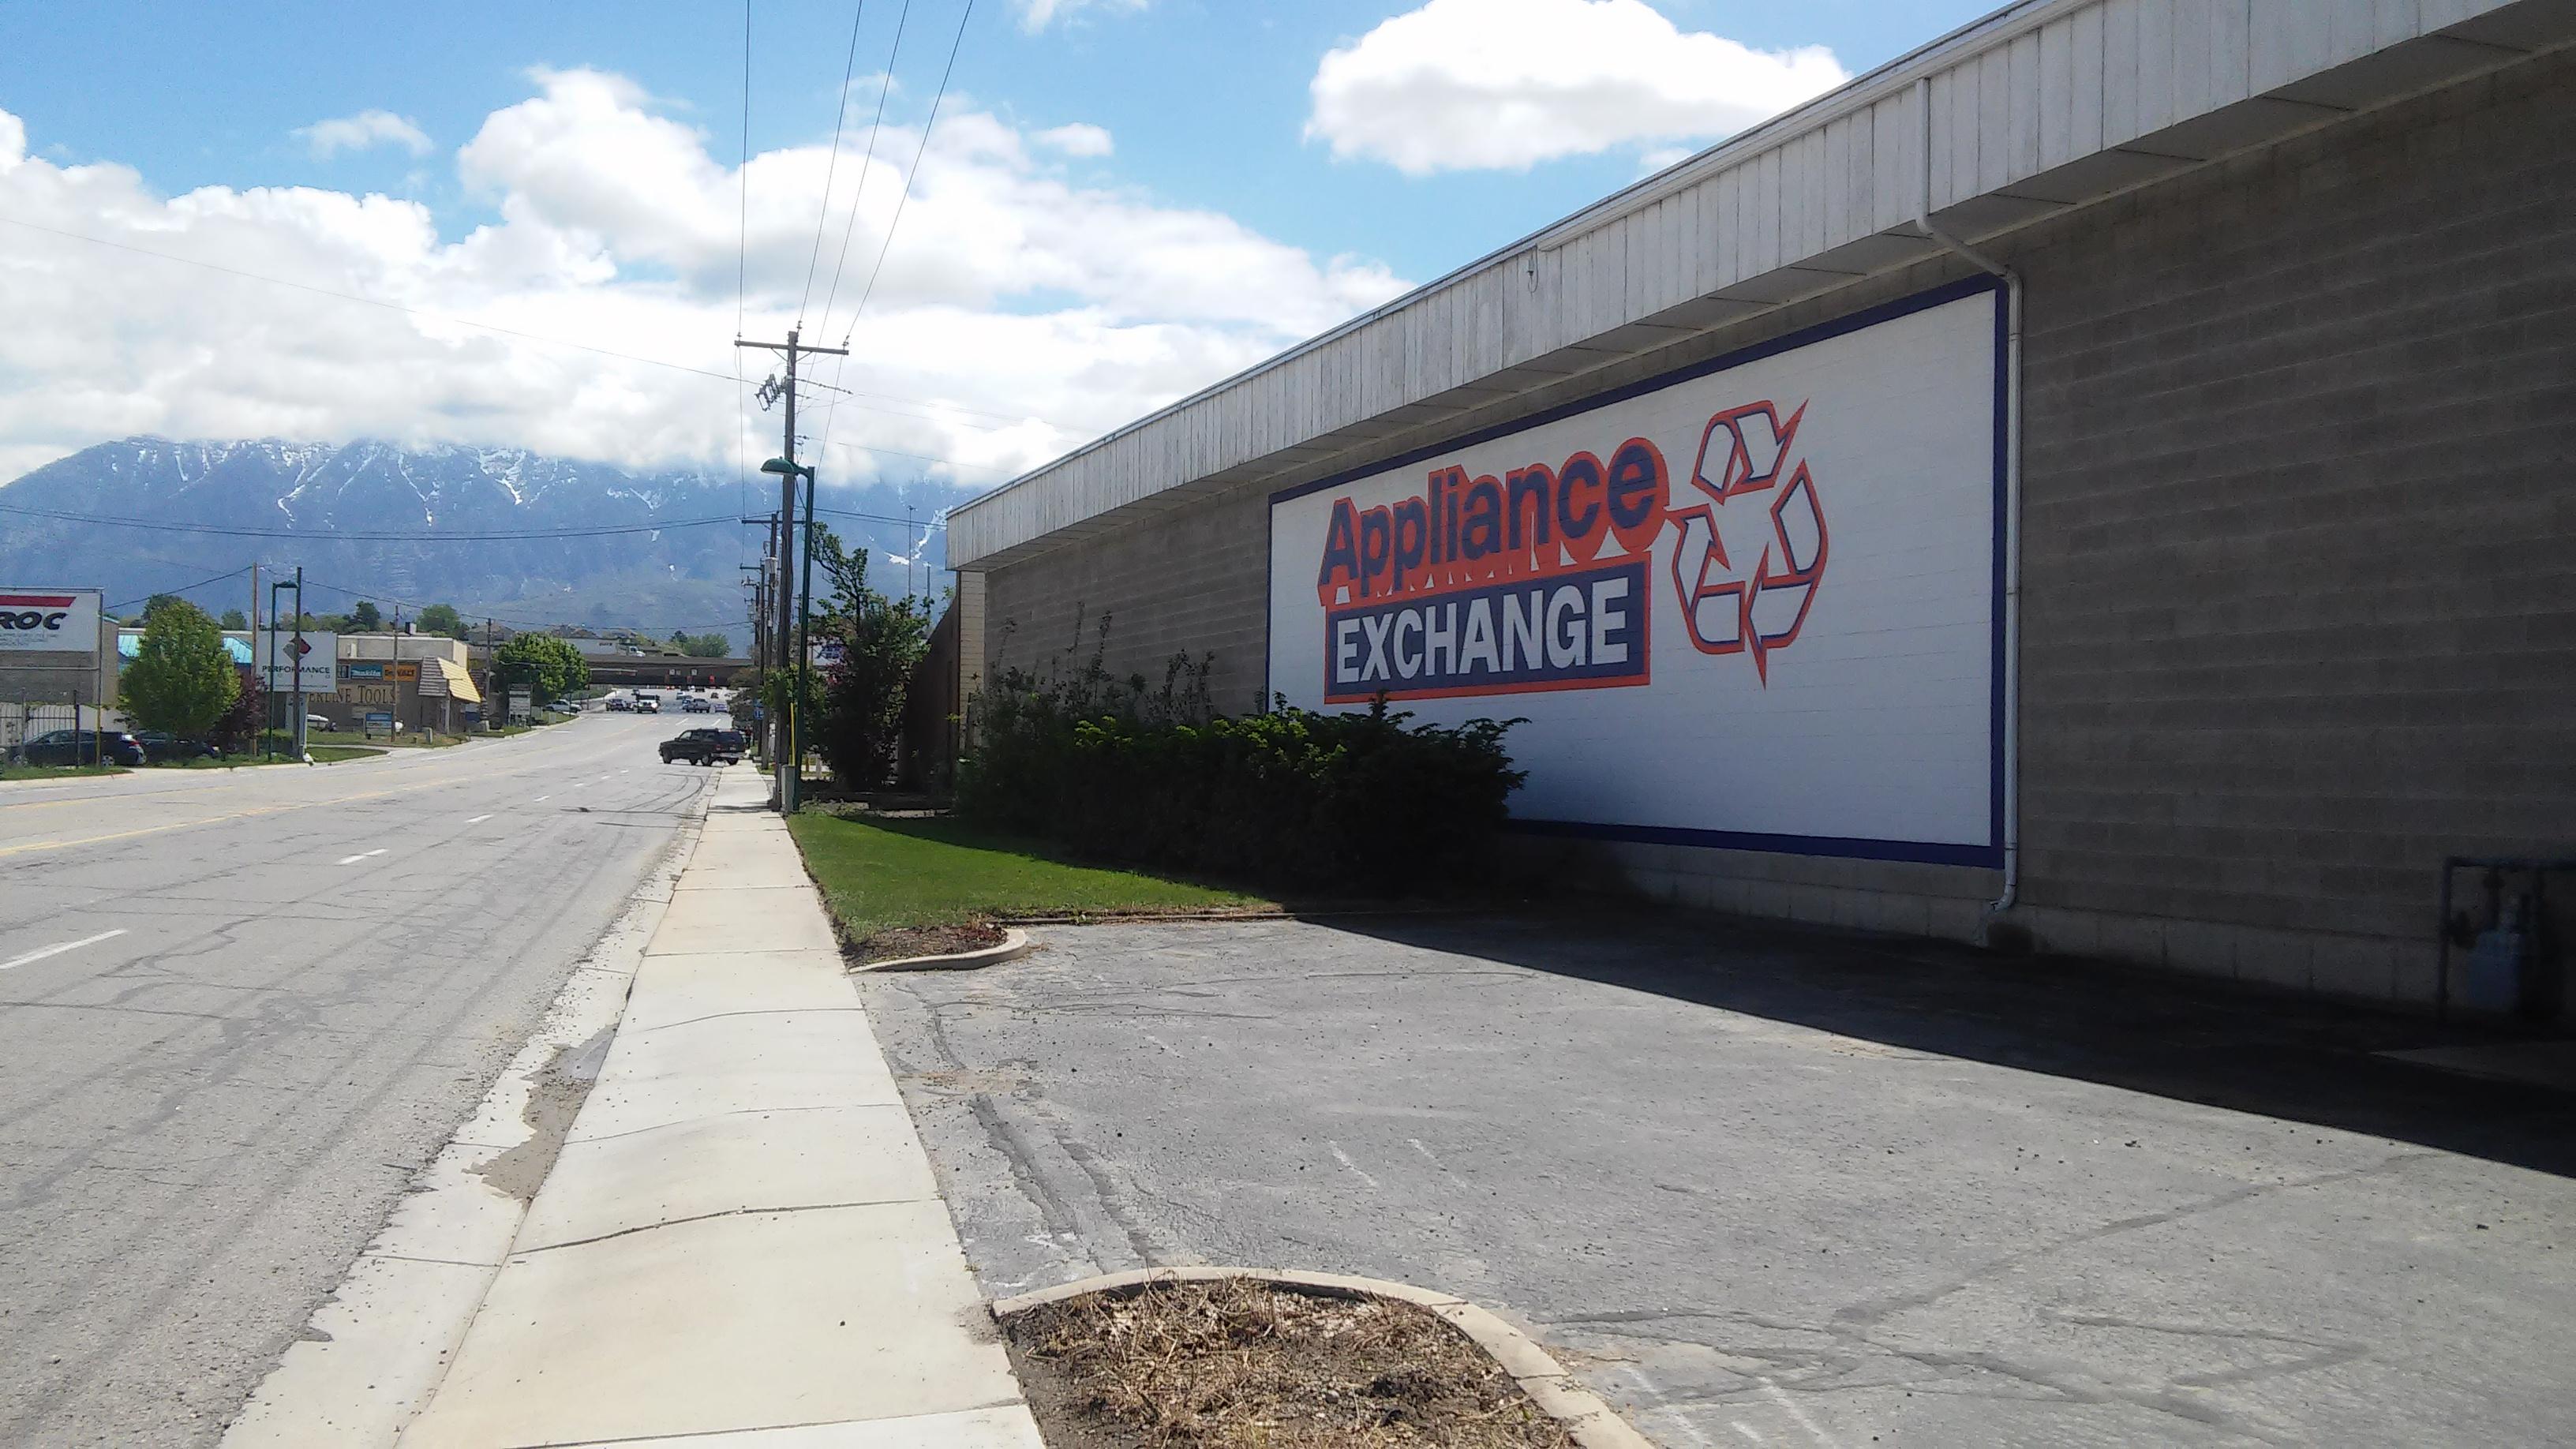 Real Property Management Wasatch Utah County Orem Ut